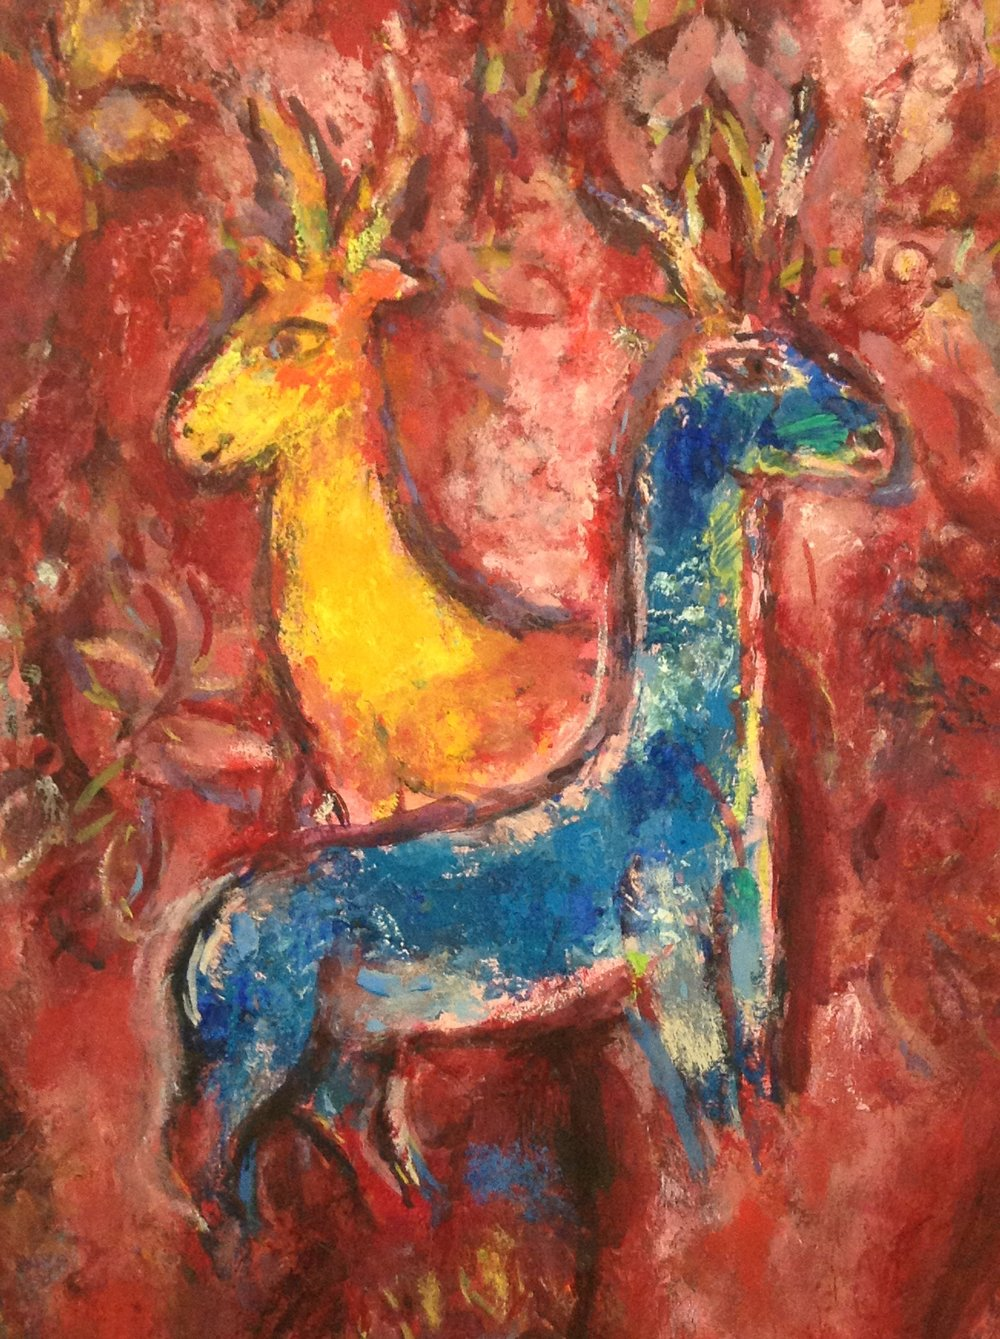 Musée marc Chagall, Nice (photo RYC)